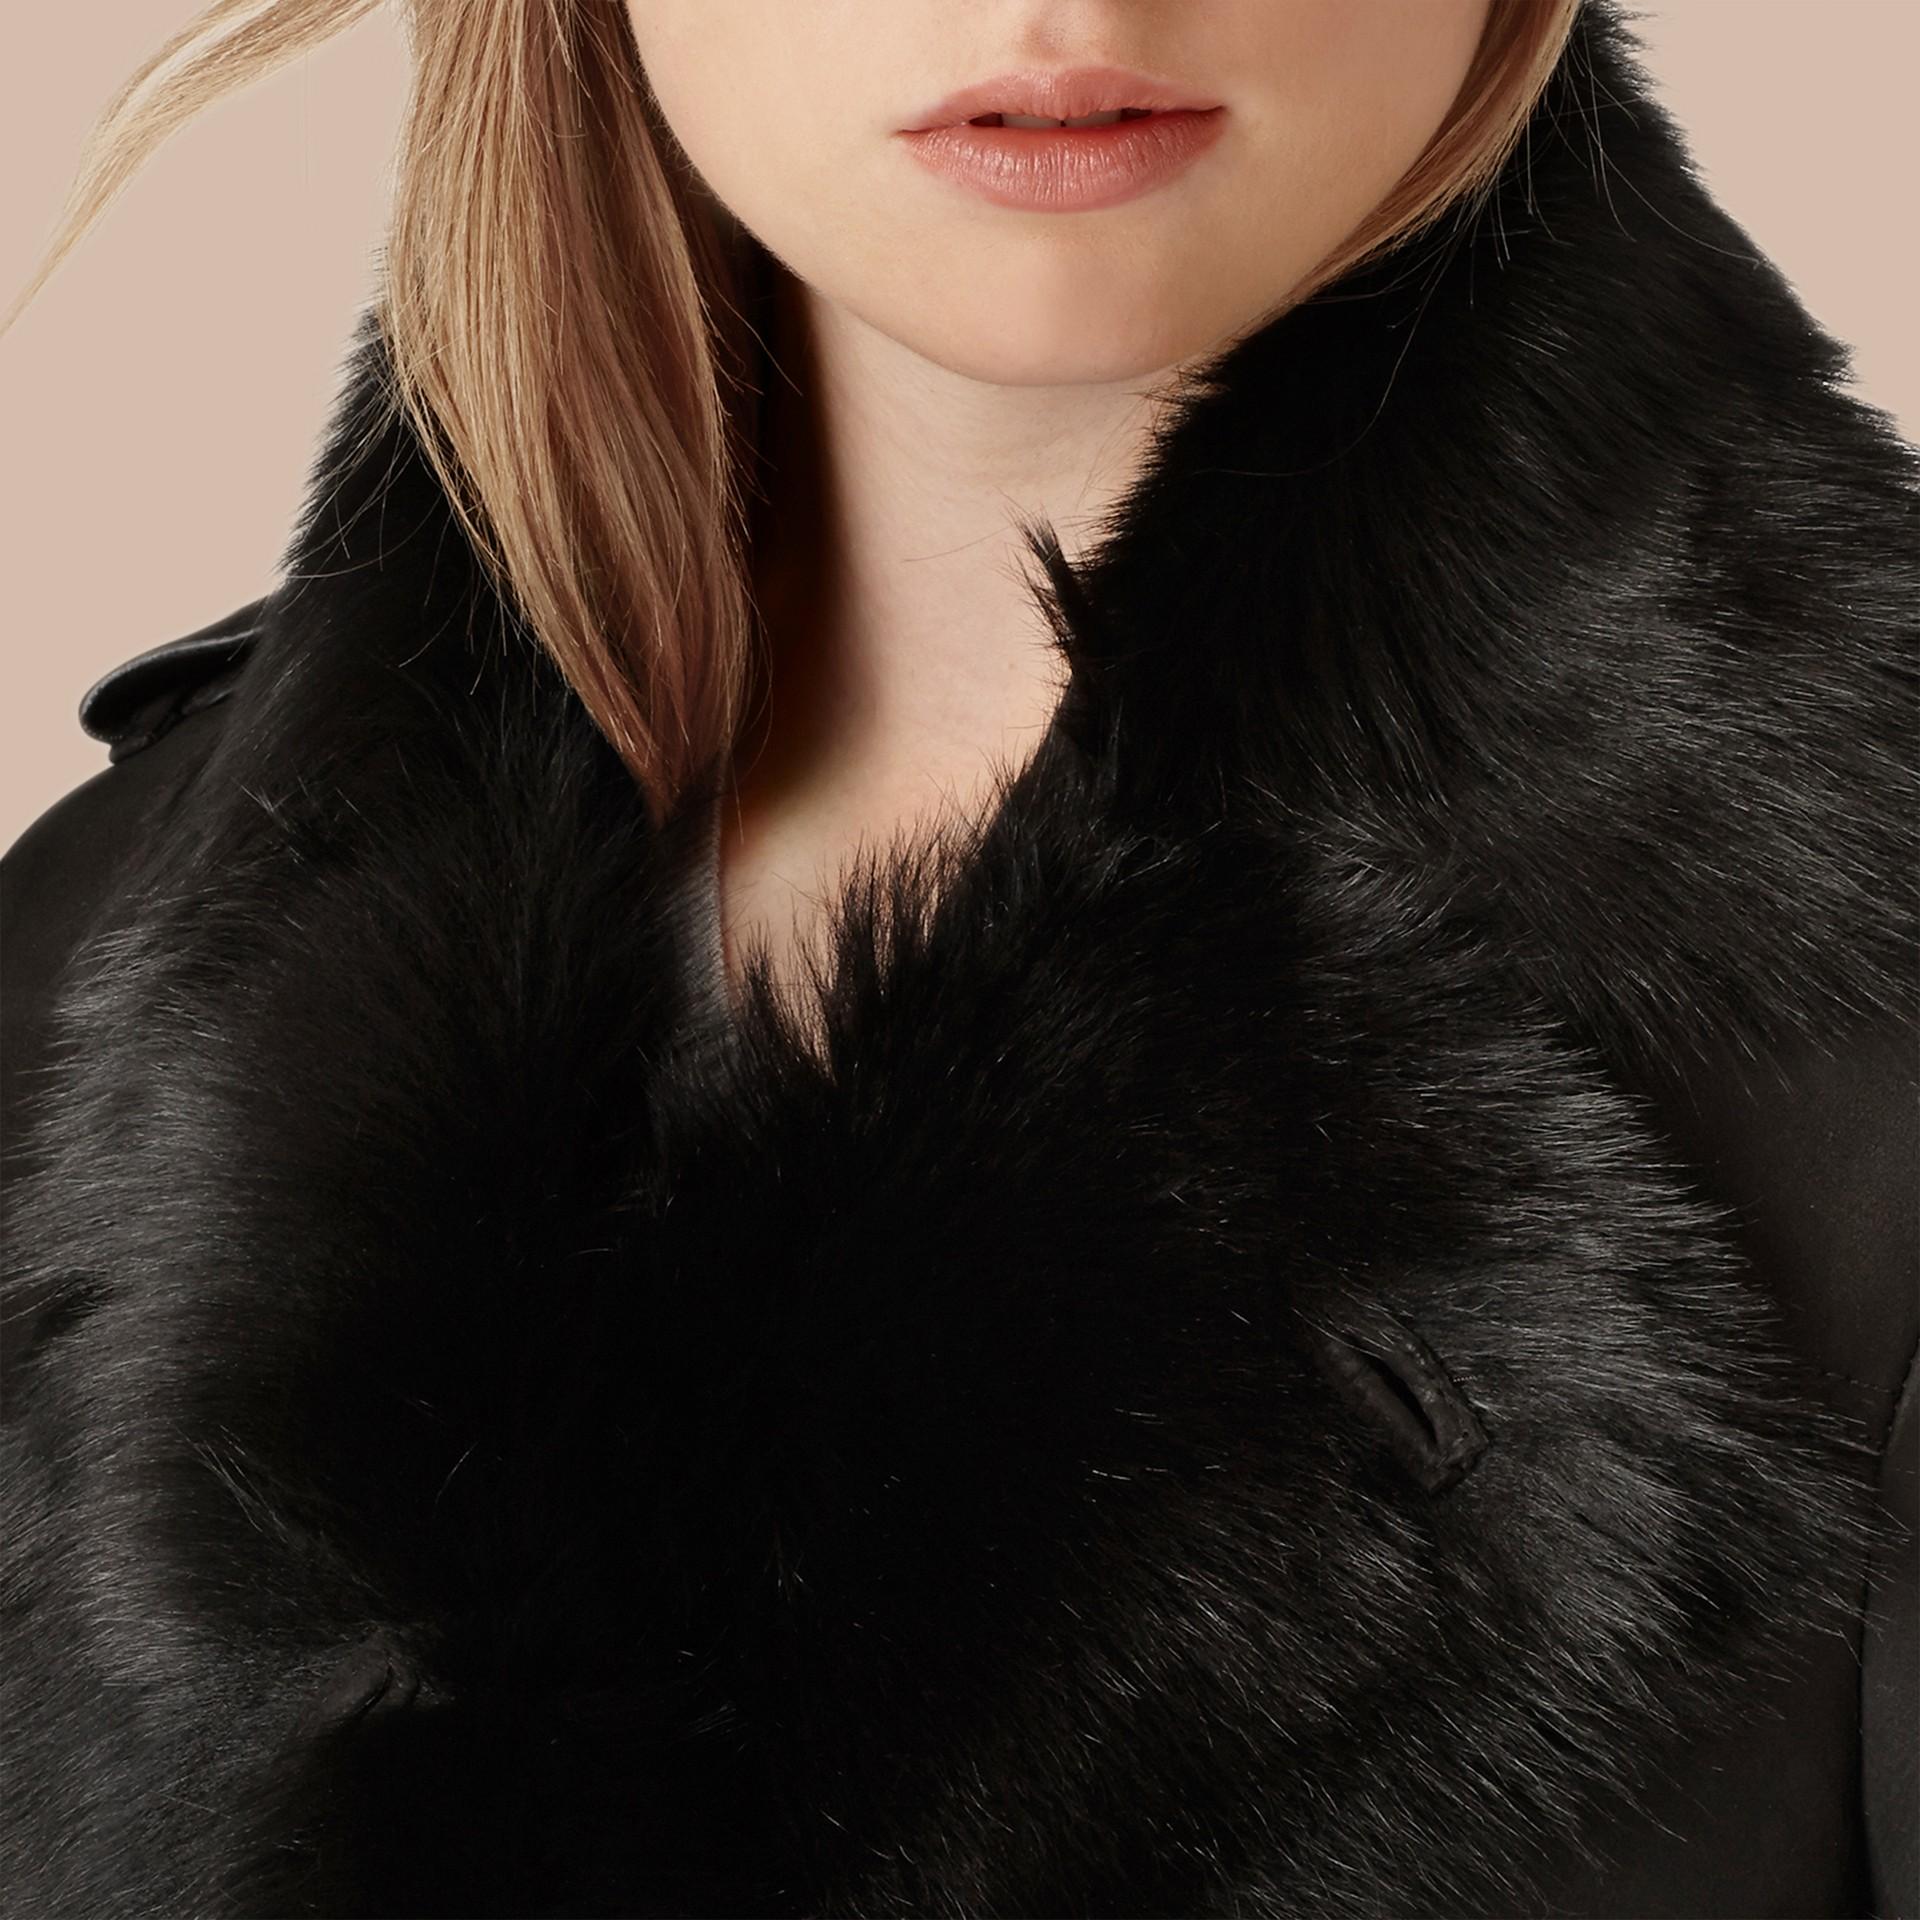 Noir Trench-coat en shearling Noir - photo de la galerie 2